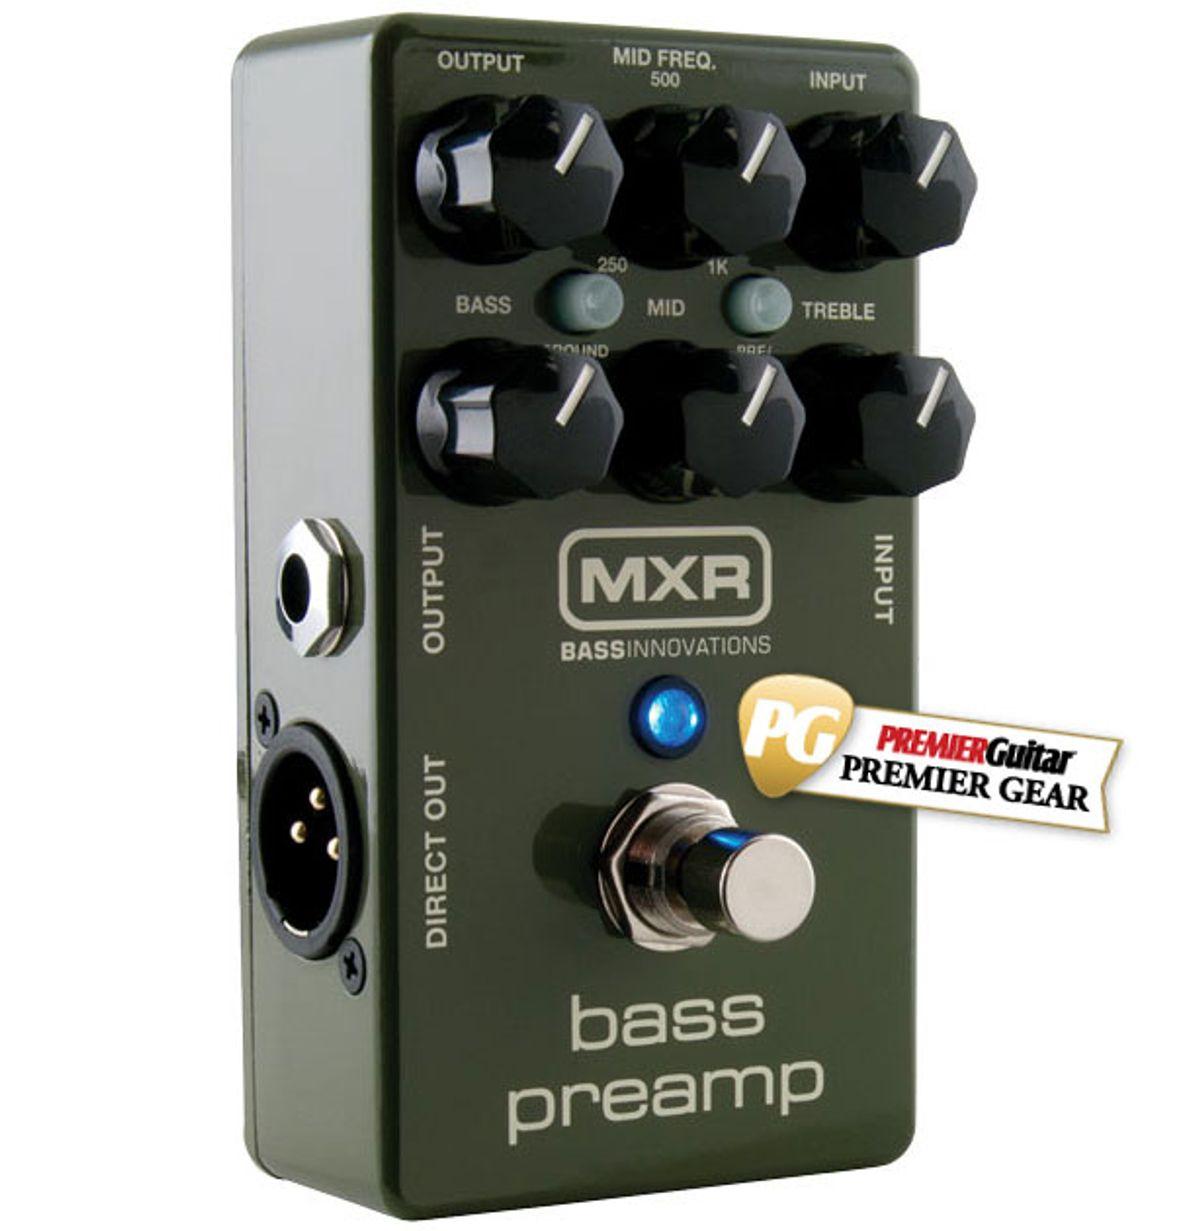 MXR Bass Preamp Review